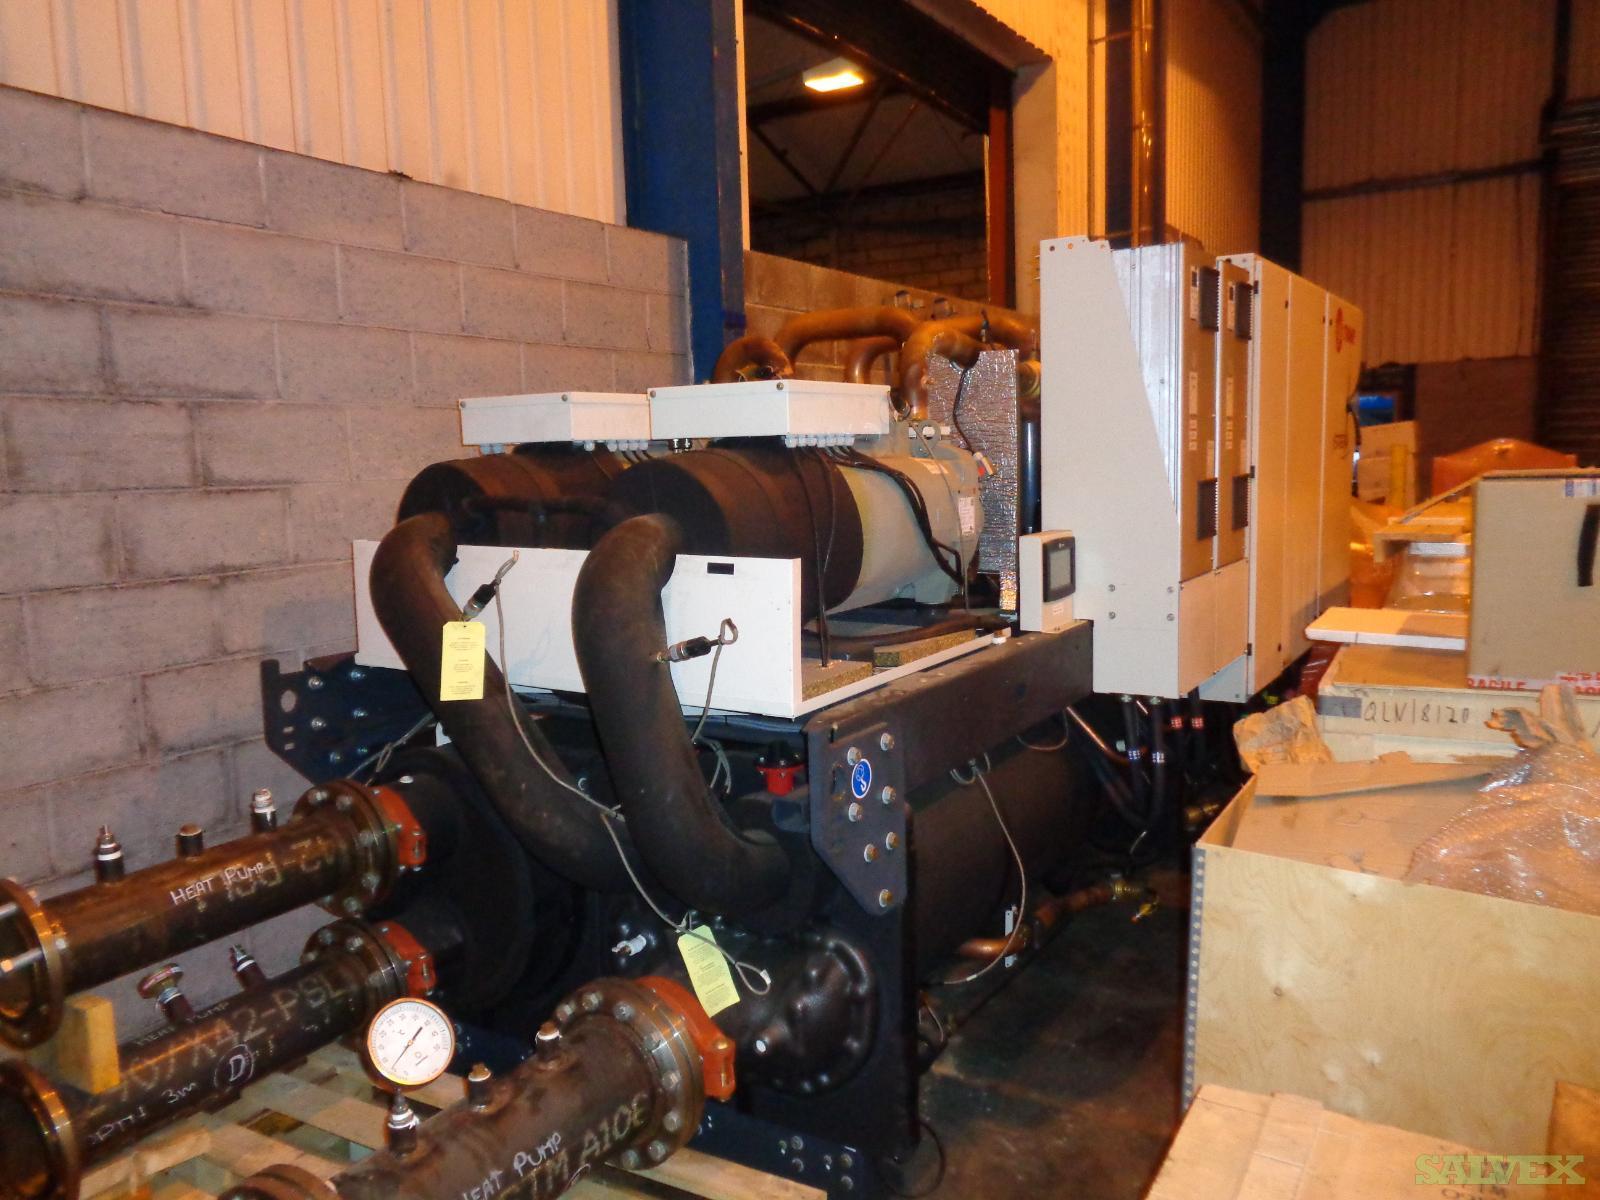 Trane type RTWF 360HSE, 400V-50 HZ-3PH Heat Pumps (2 Units) in Scotland, United Kingdom